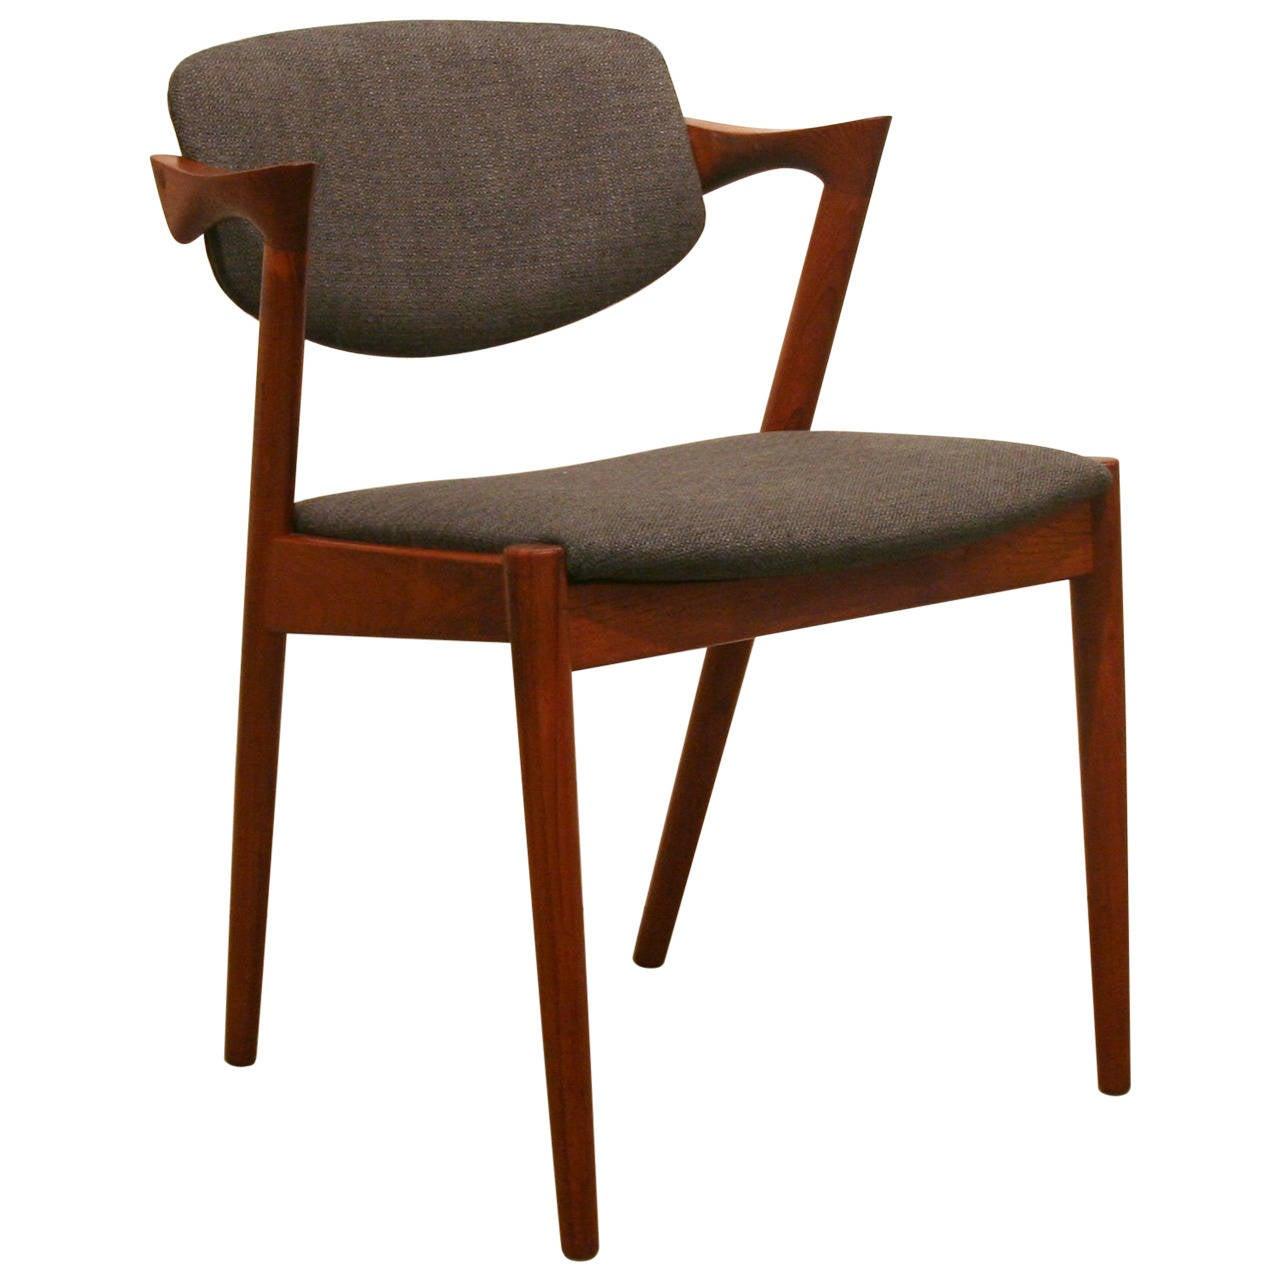 Vintage danish teak dining chair at stdibs